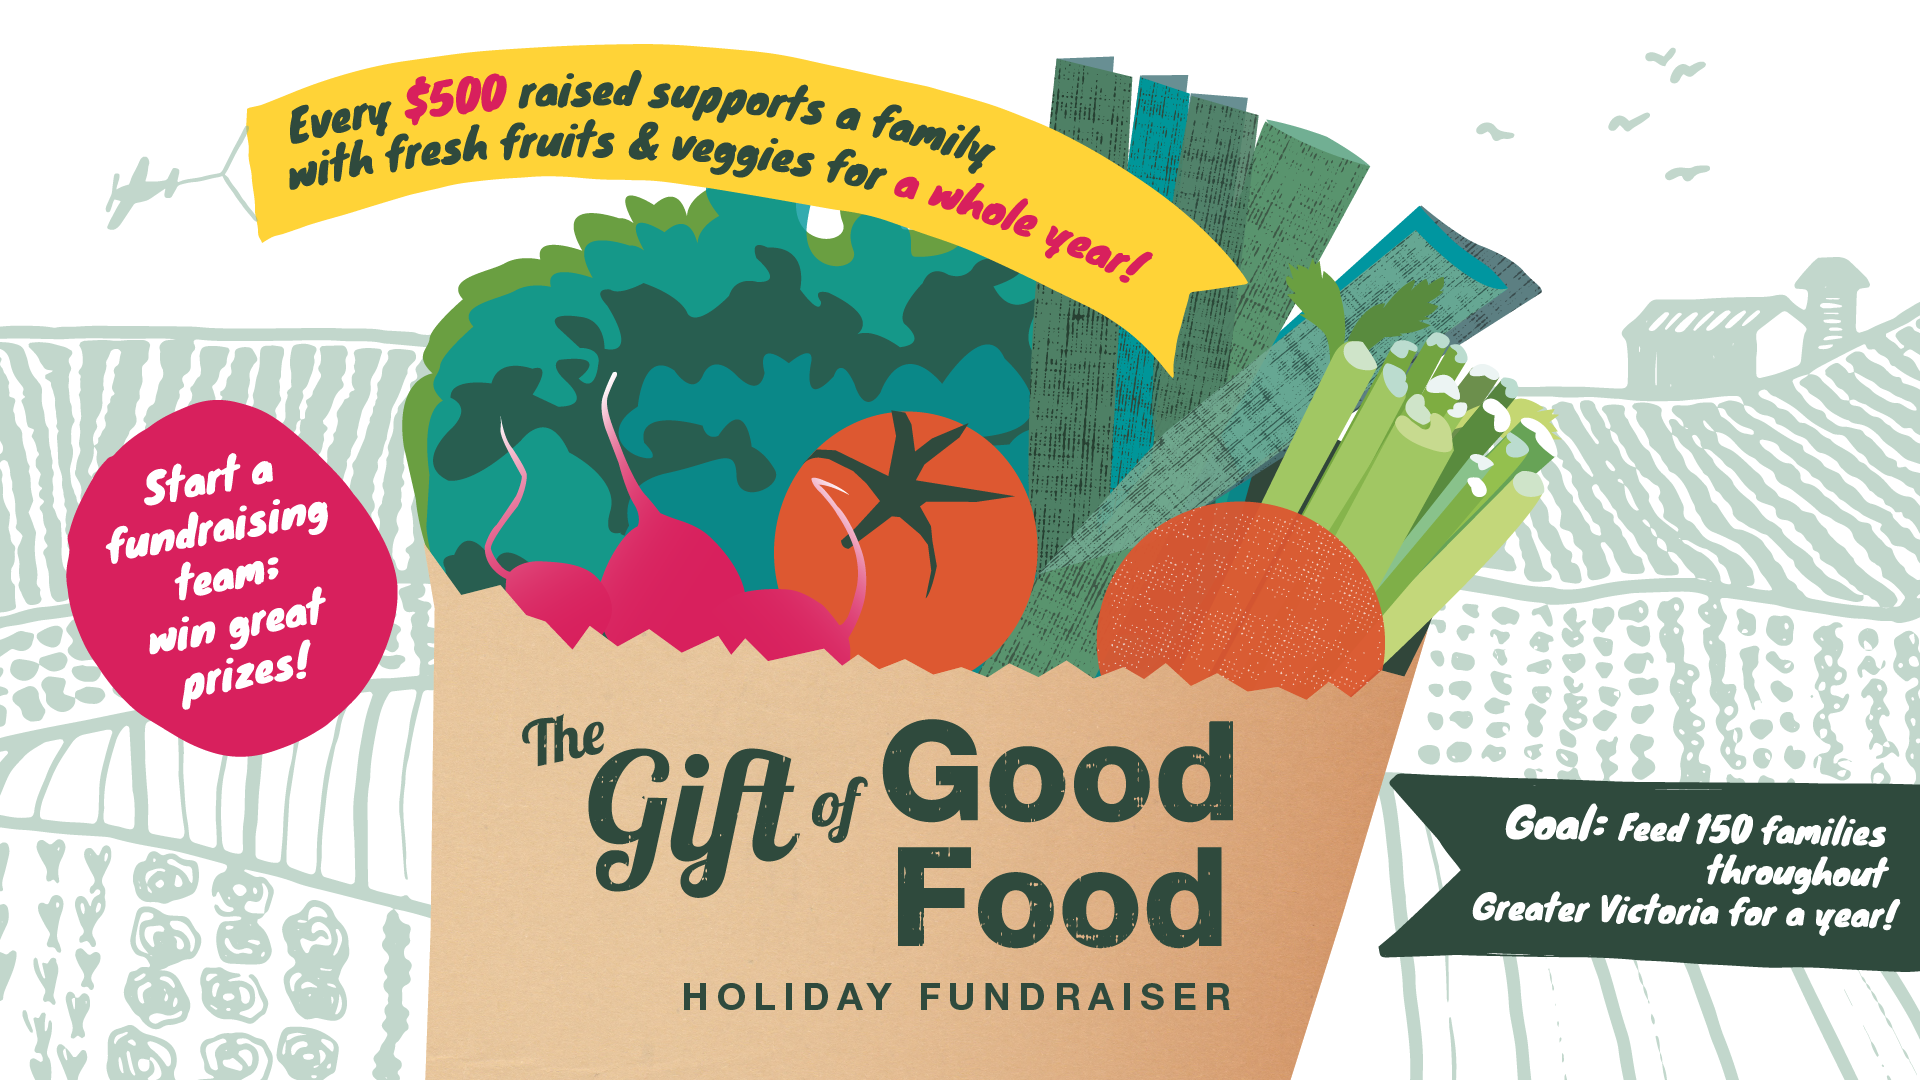 GiftofGoodFood-2017-Fundraising-Team